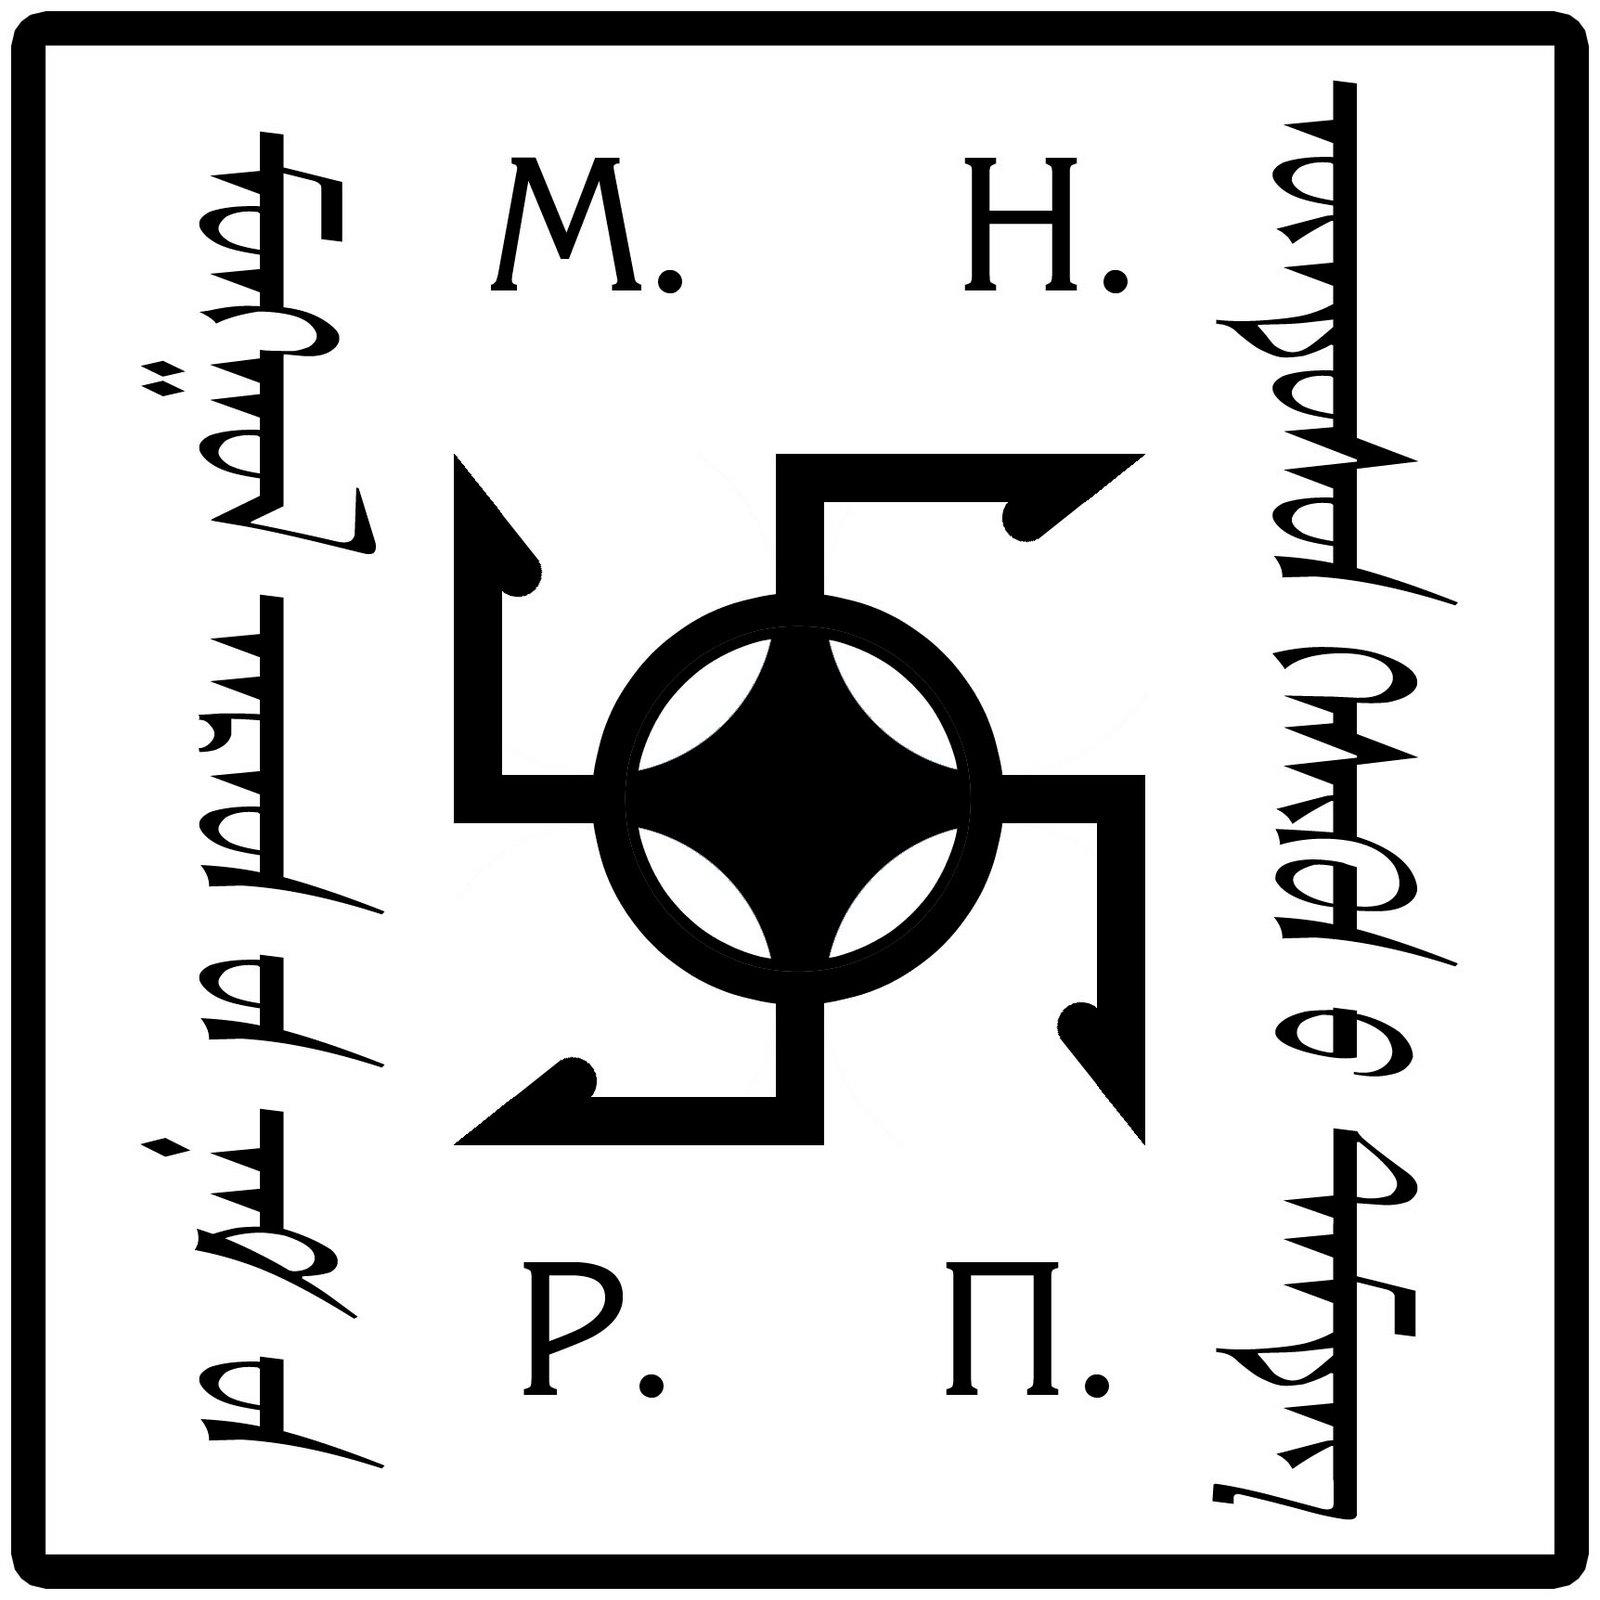 Photopodborka_044.jpg